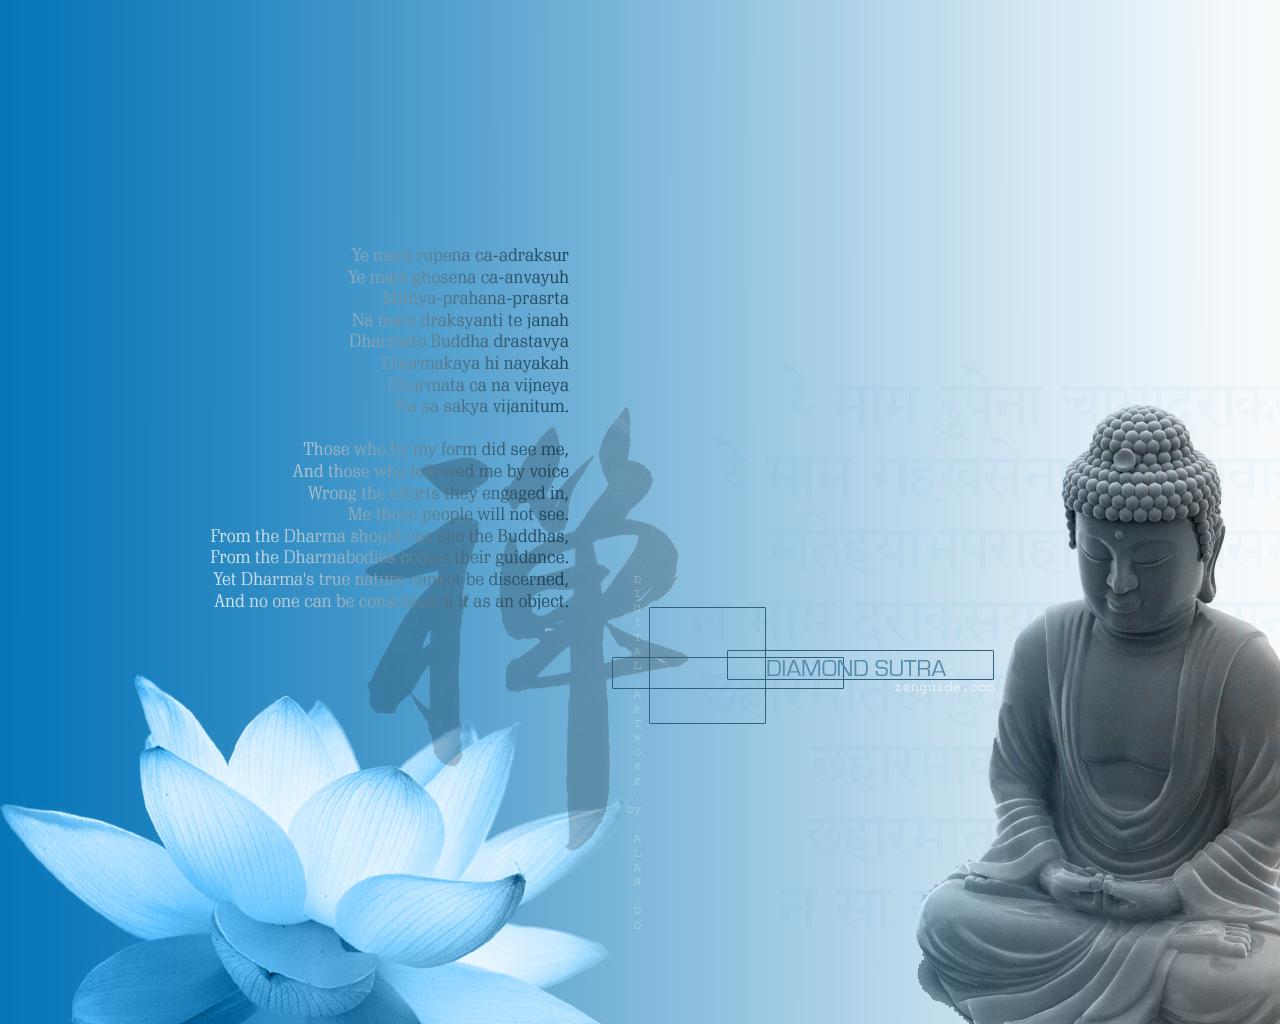 Organizations Offering Spiritual Growth